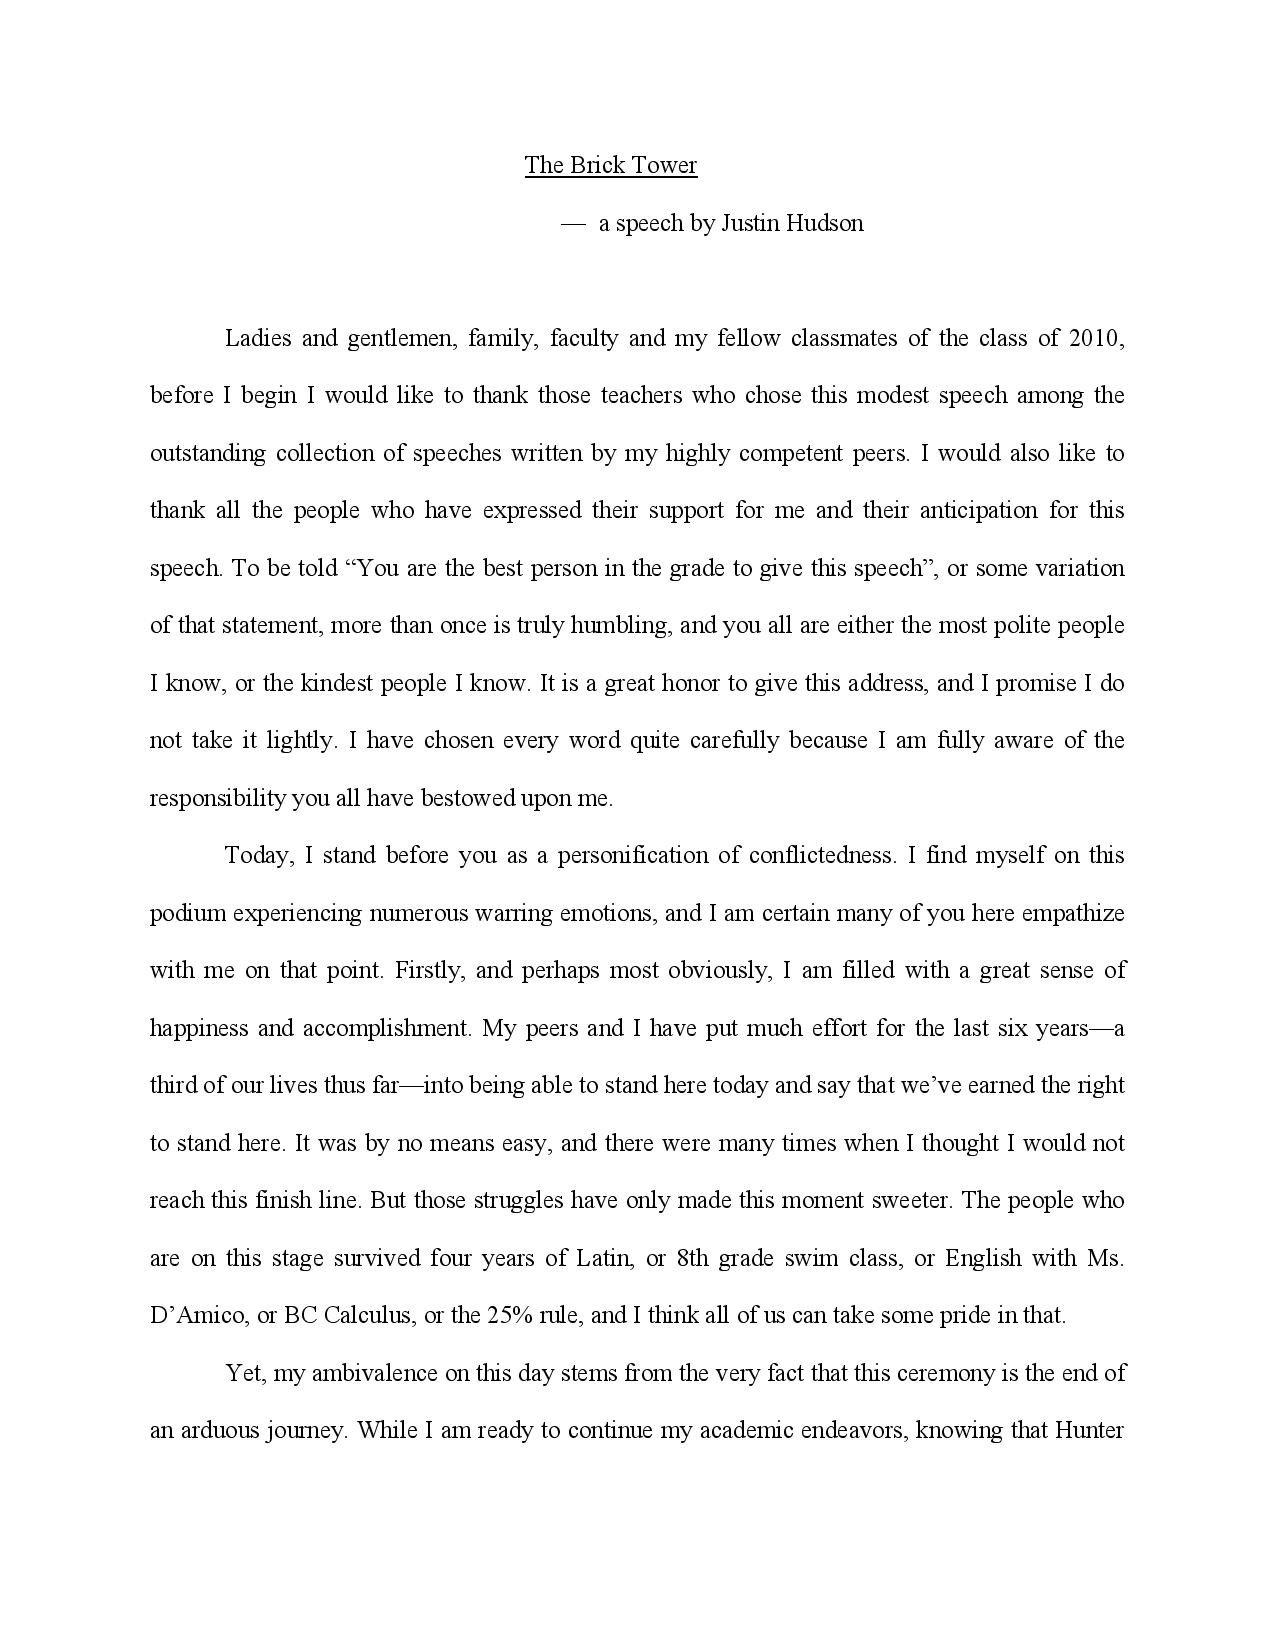 10 Gorgeous 8Th Grade Graduation Speech Ideas 9 school speeches examples samples in pdf 2021